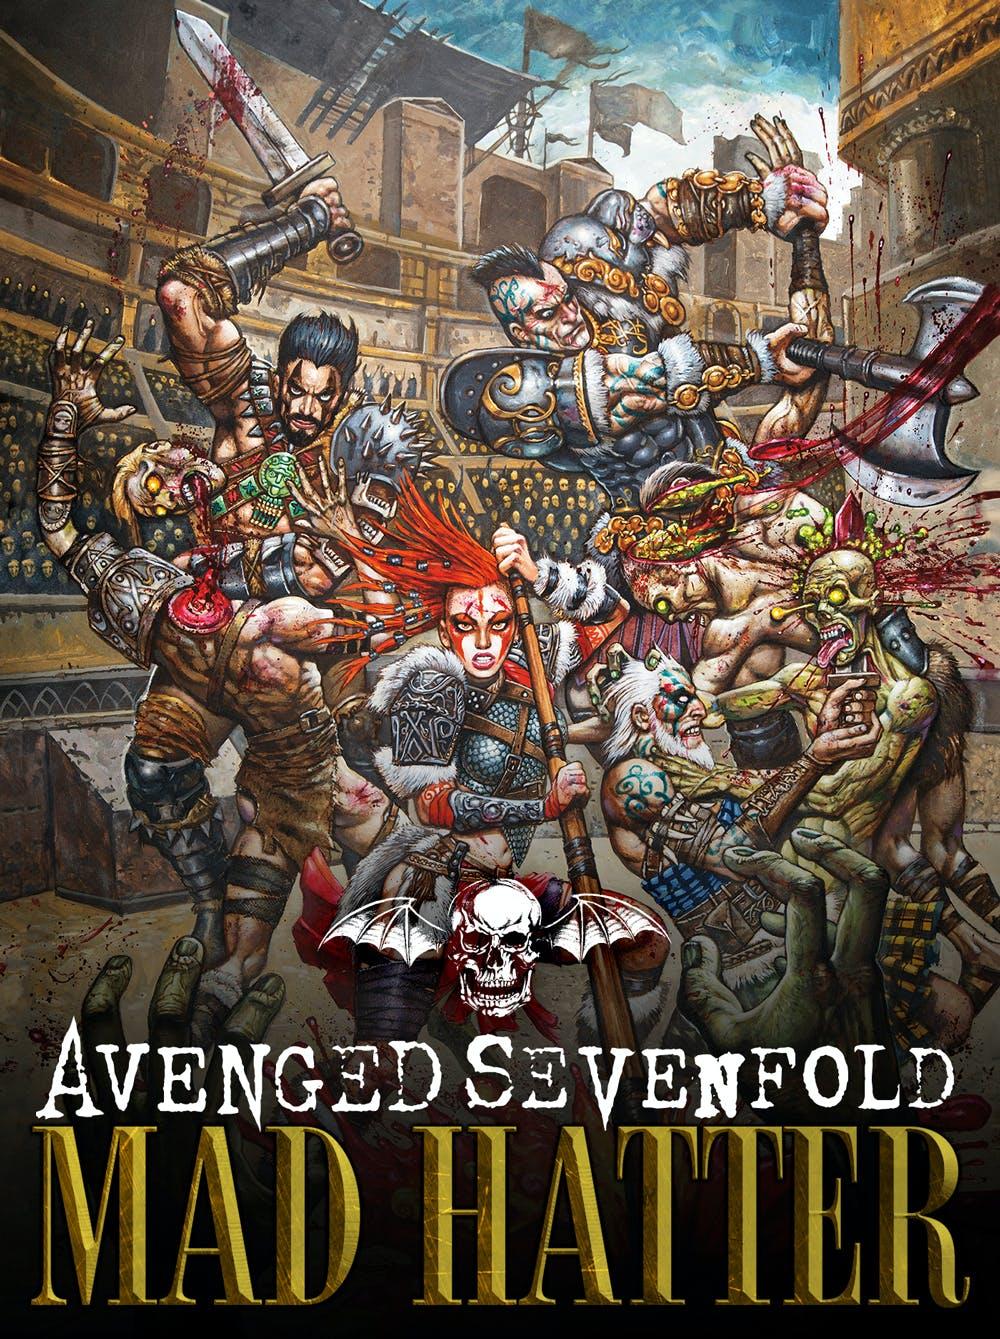 Avenged Sevenfold Mad Hatter